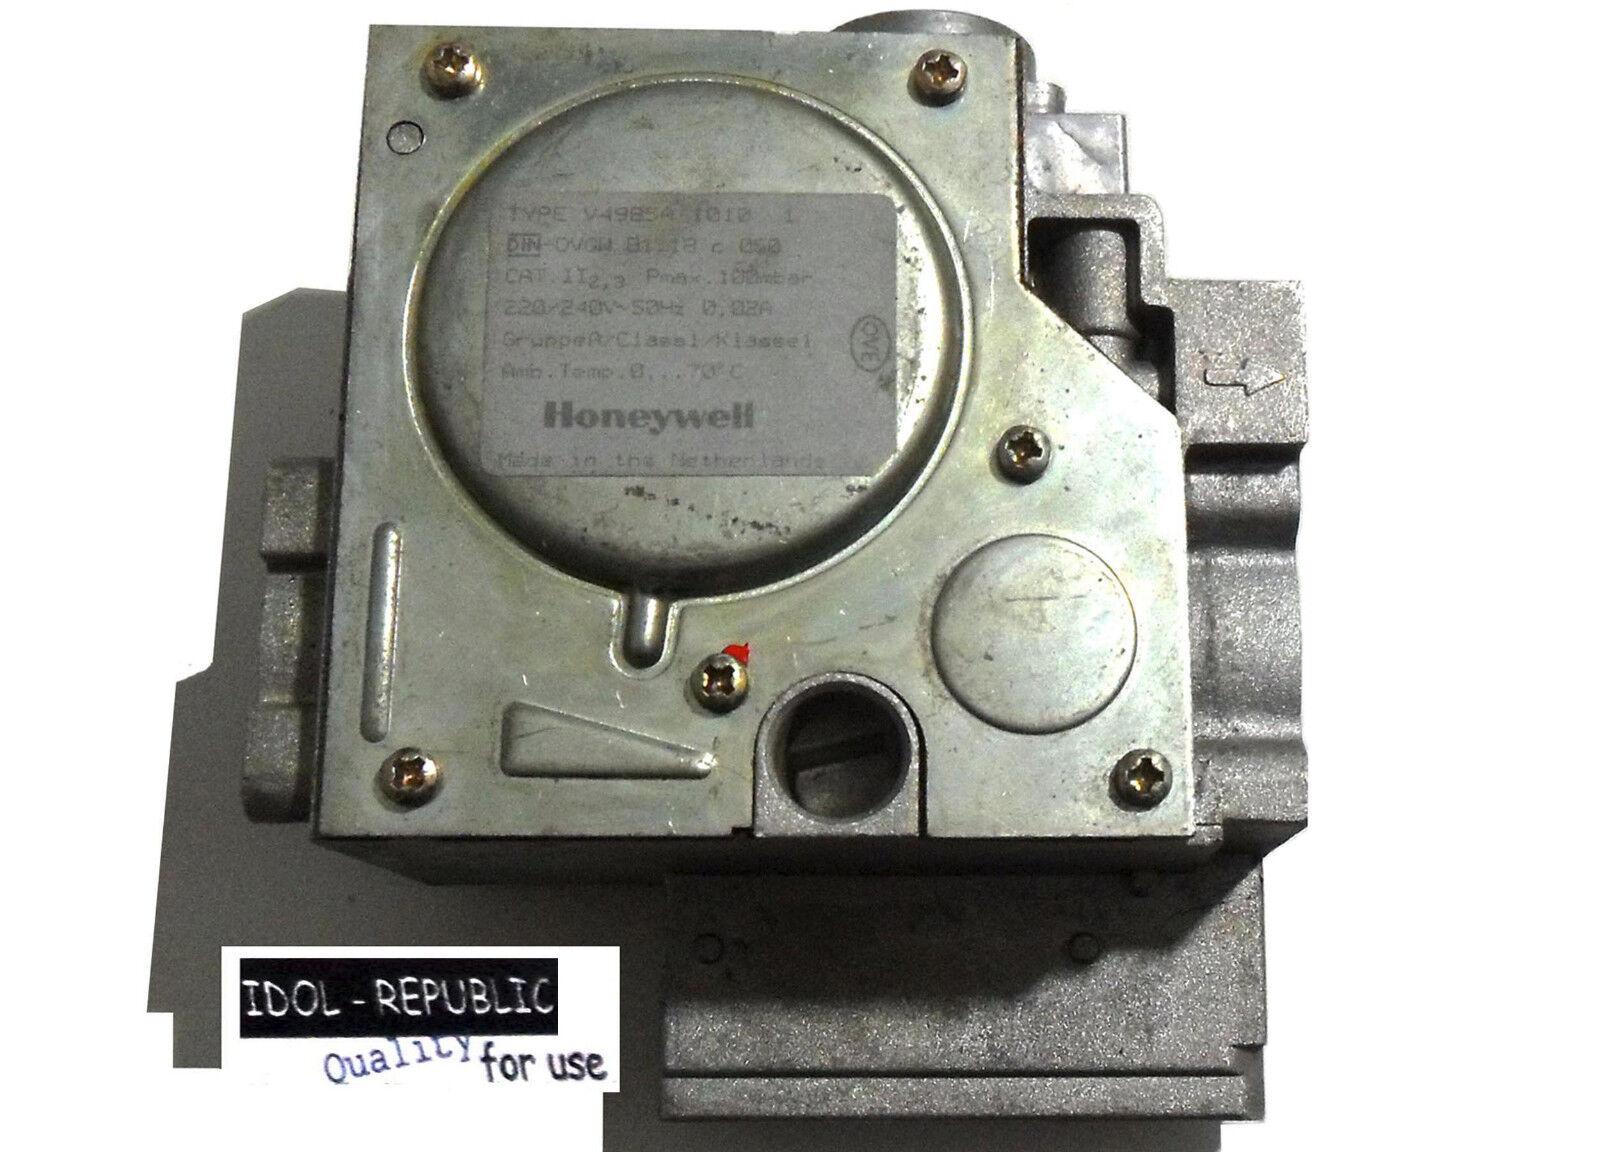 Honeywell - V4985A 1010 1 - Gaskombiventil - V 4985 A - Gasarmatur